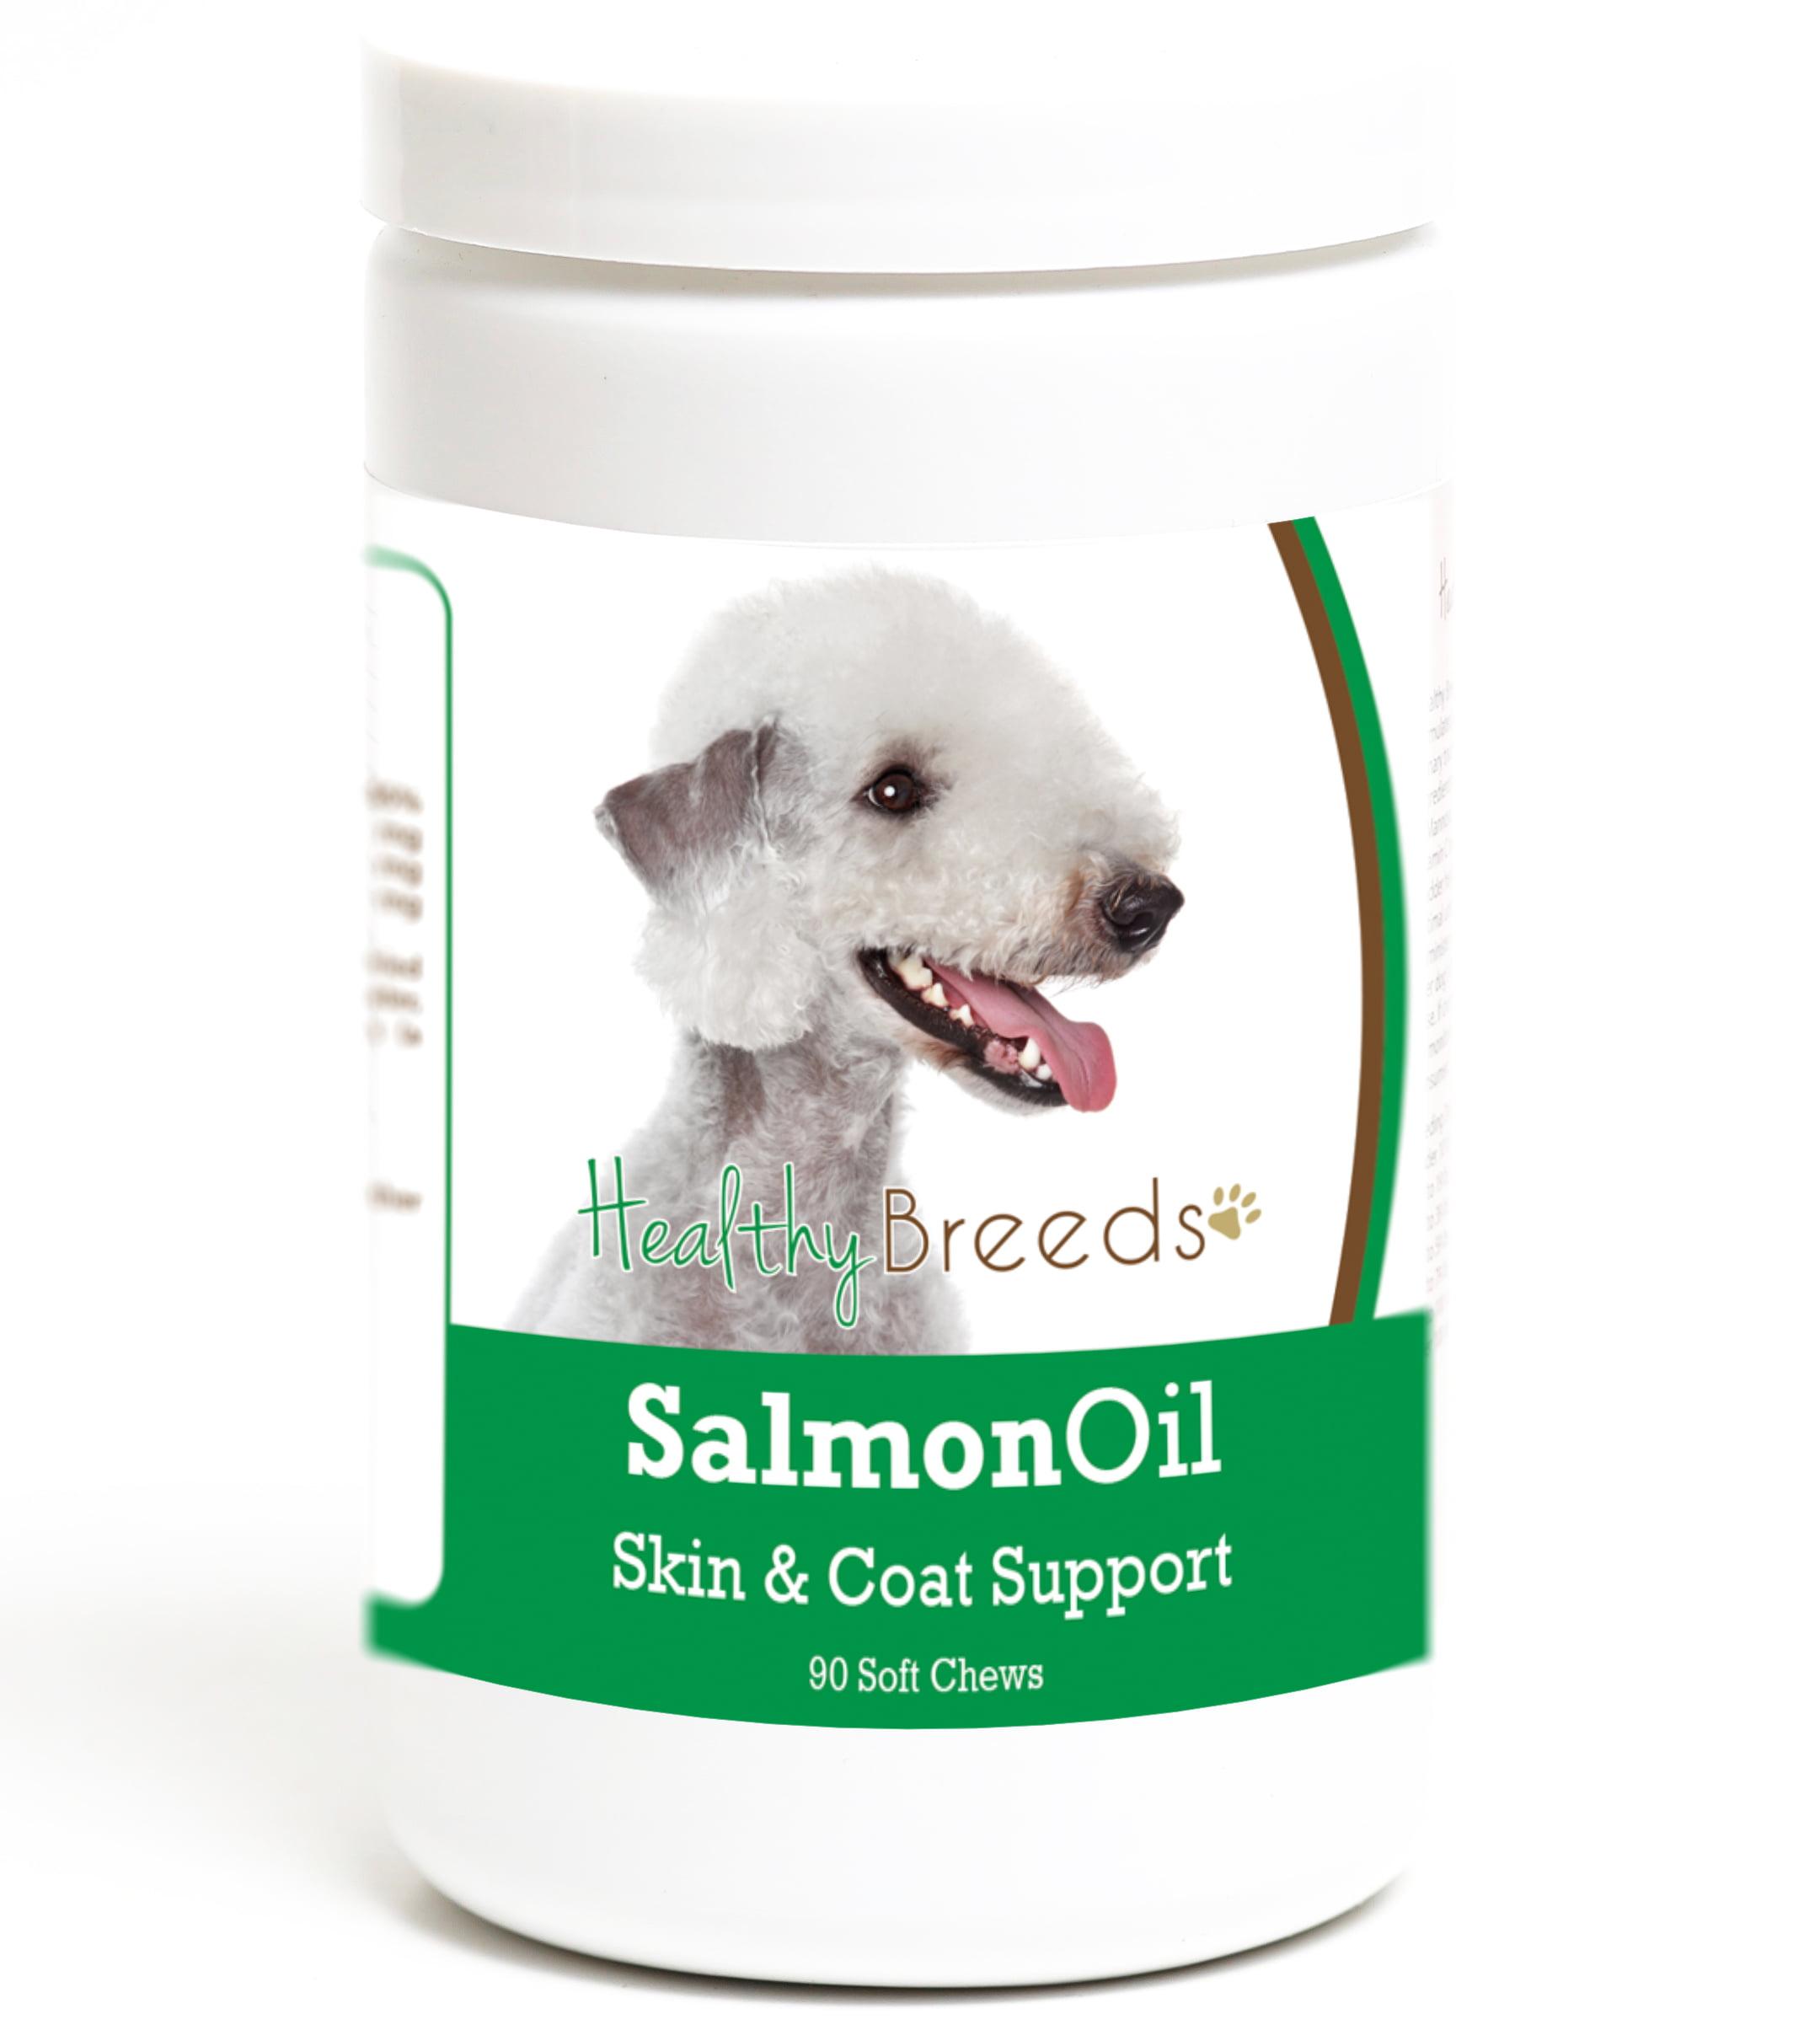 Healthy Breeds Bedlington Terrier Salmon Oil Soft Chews 90 Count